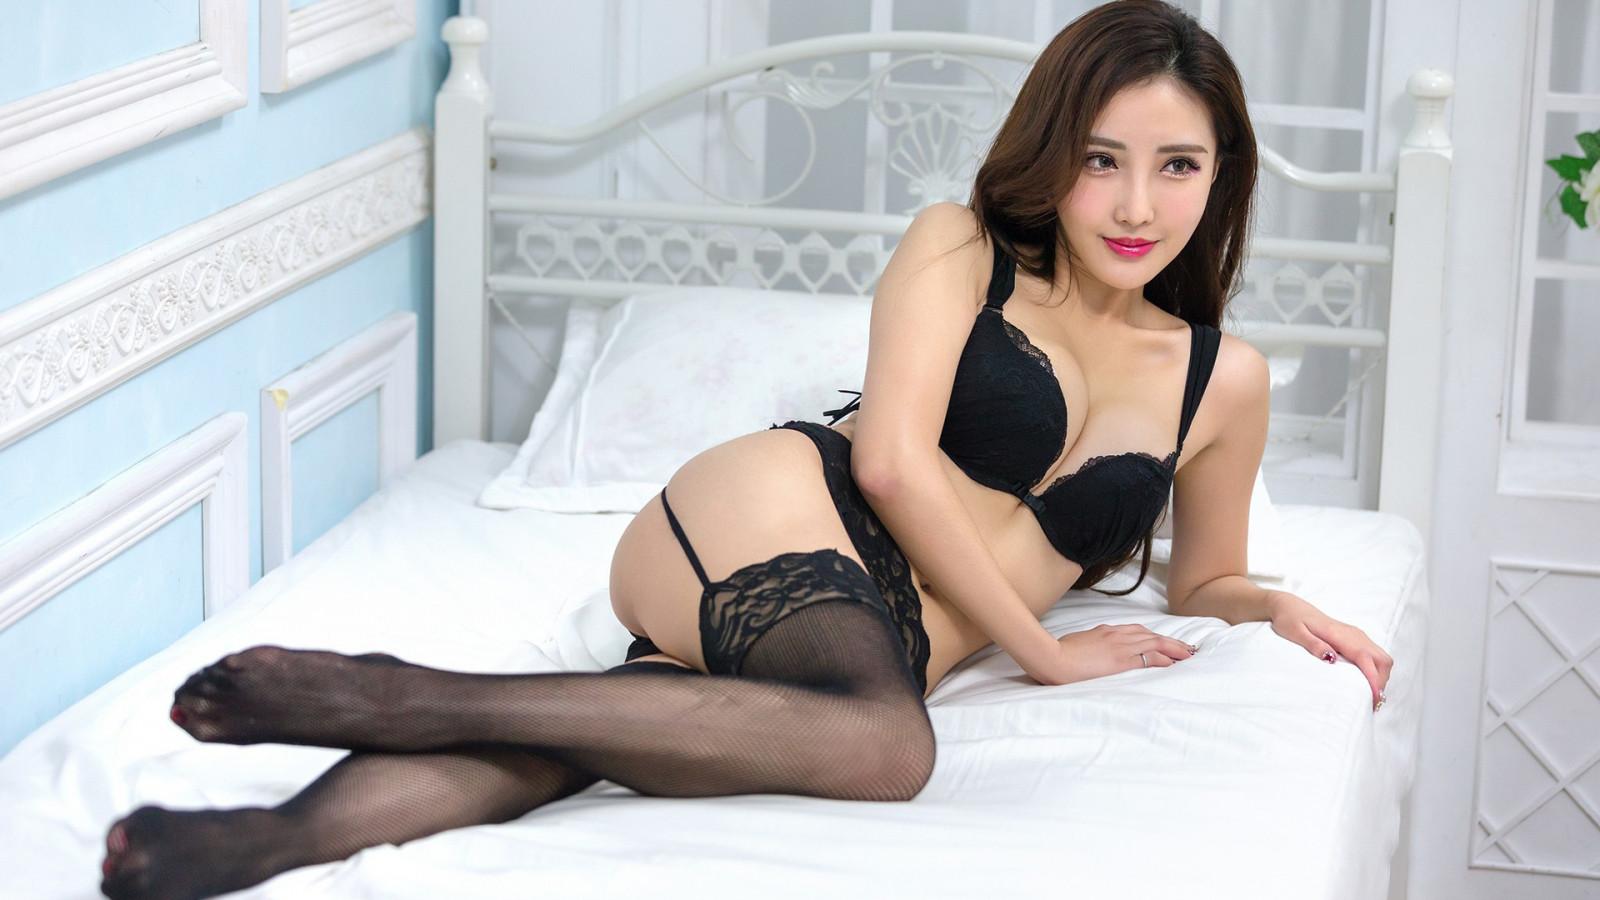 Wallpaper  Bra, Stockings, Brunette, Black Panties, Asian -1000